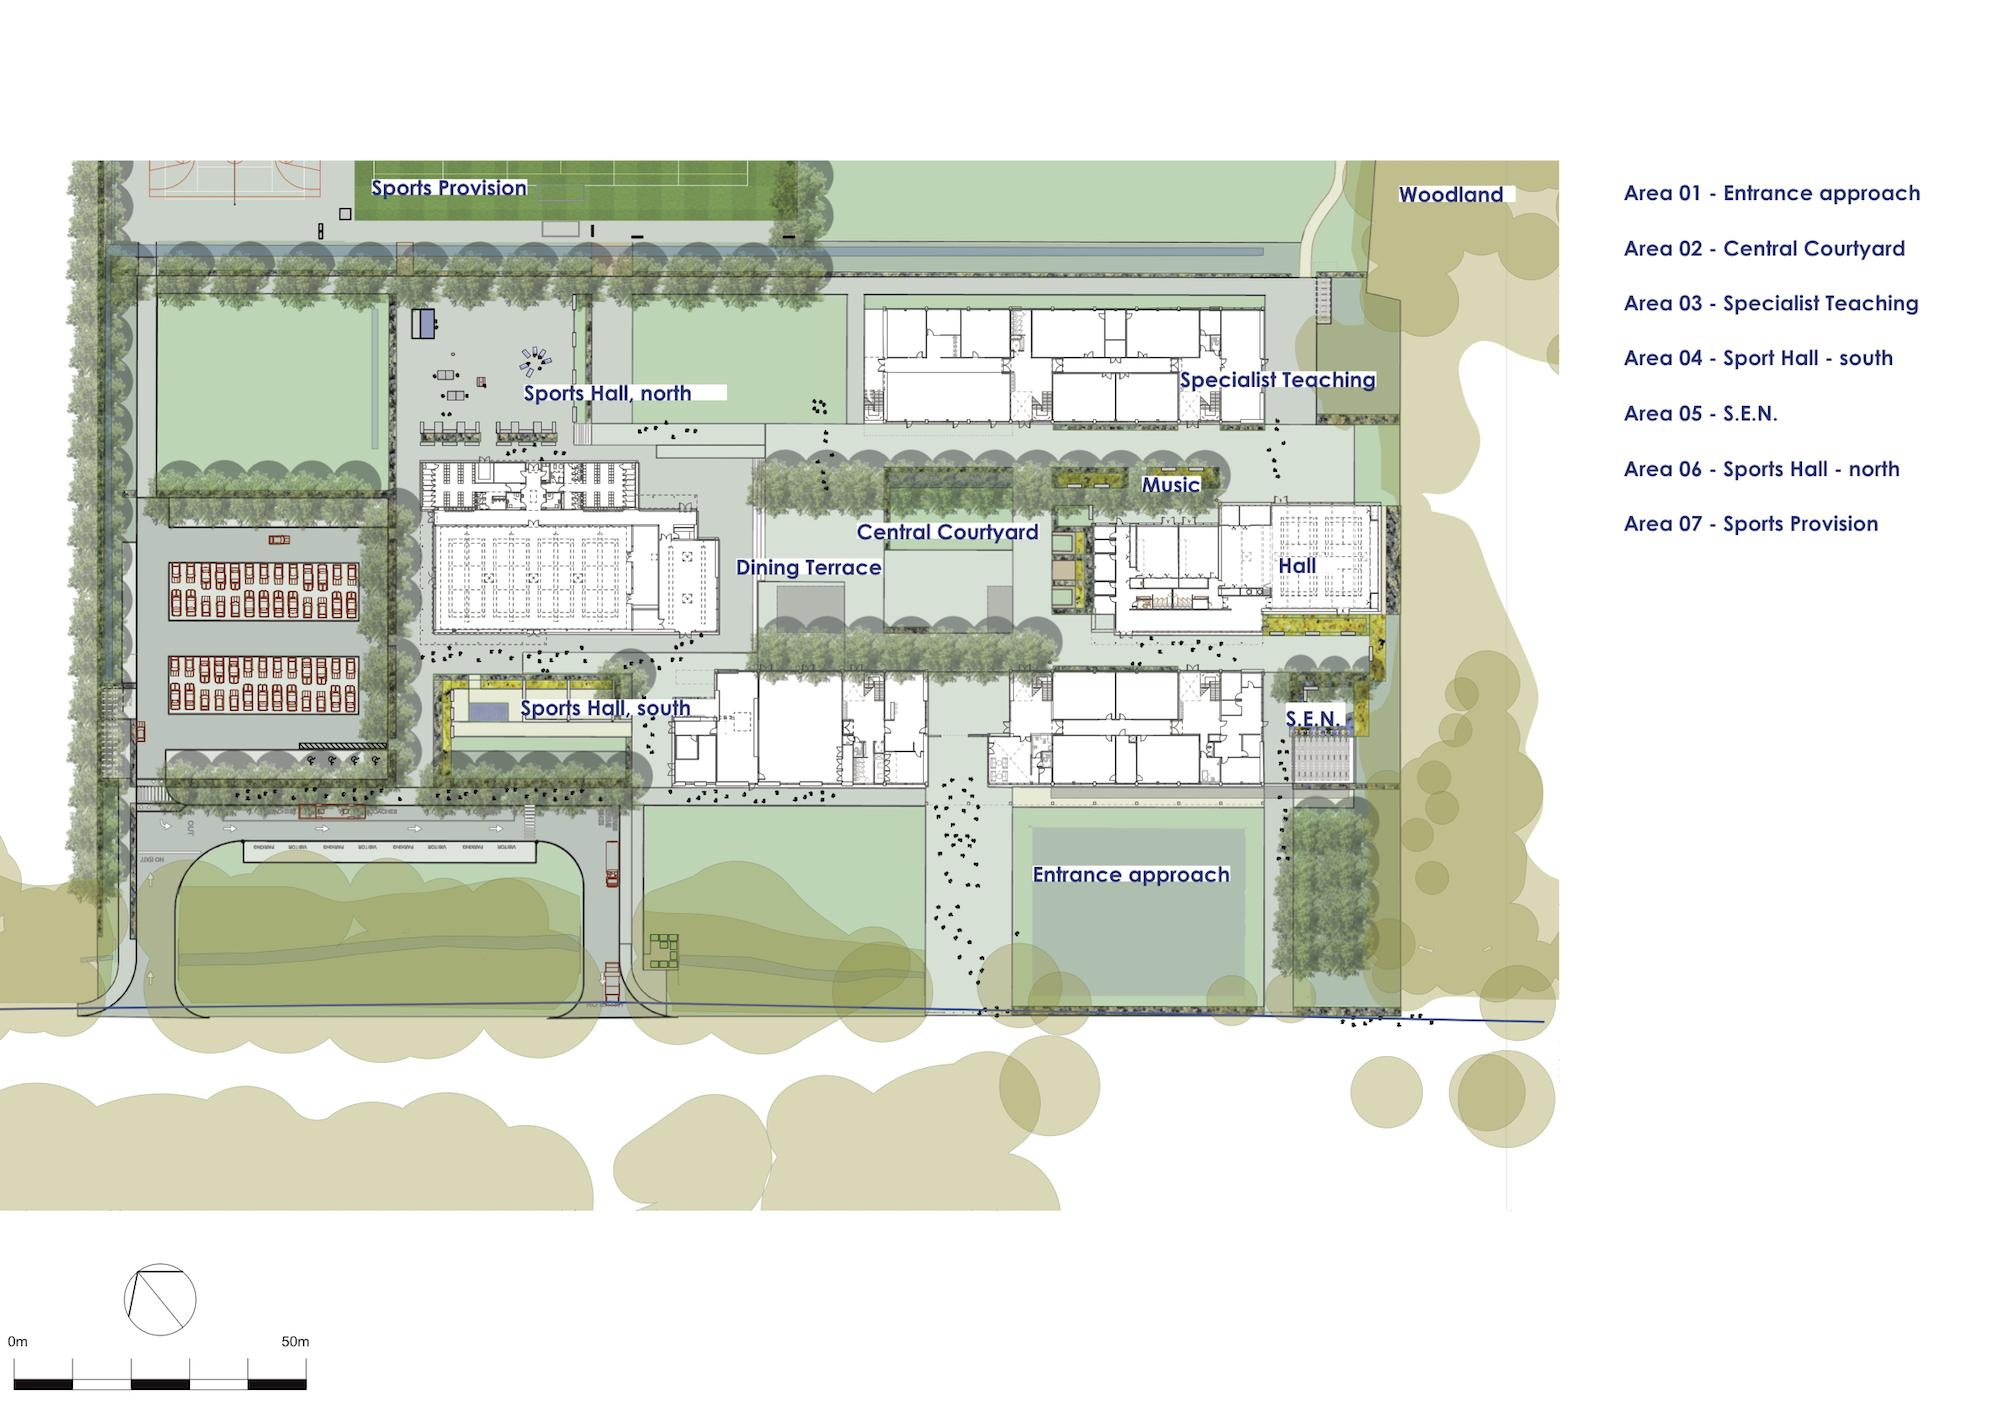 Mill Chase Academy new secondary school design 01.jpg